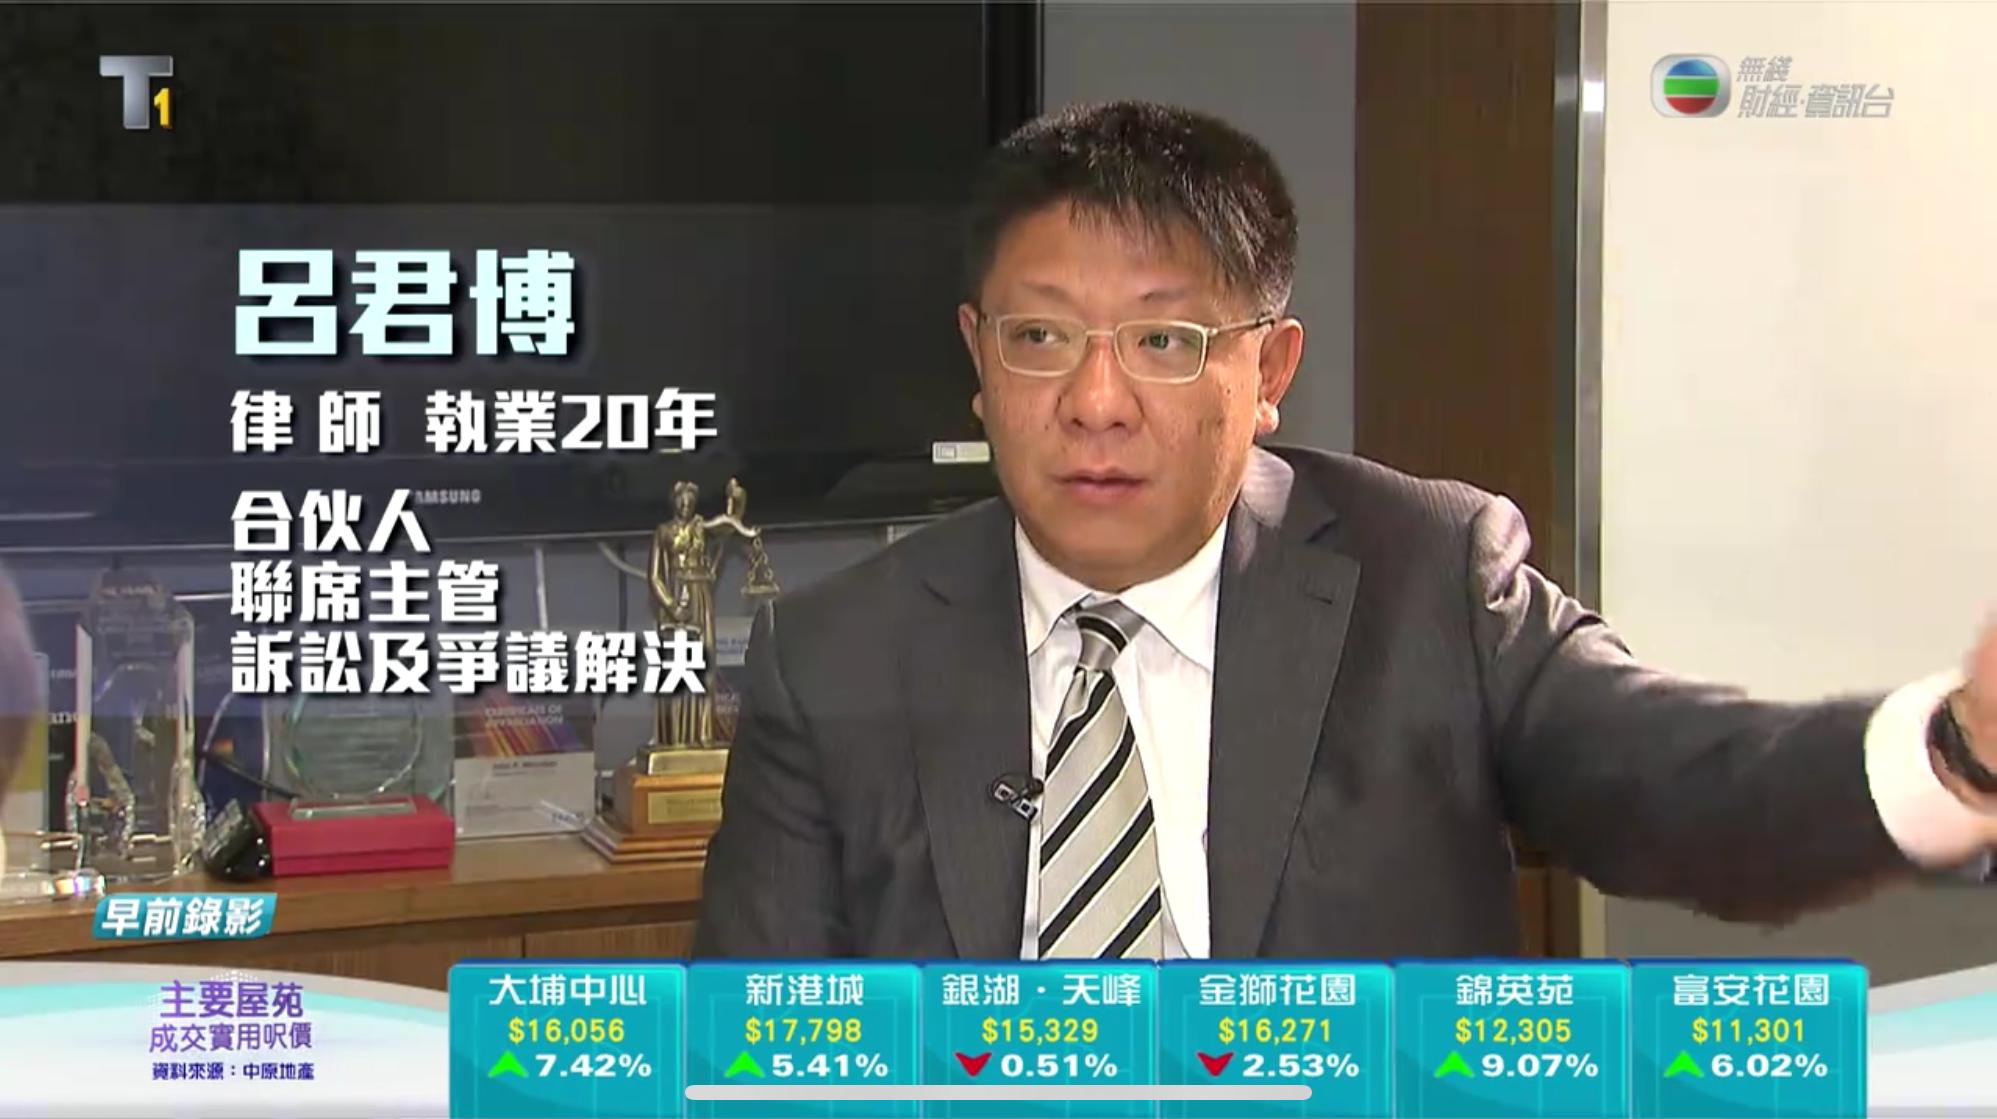 Haldanes Pual Lui TVB Interview - News & Events